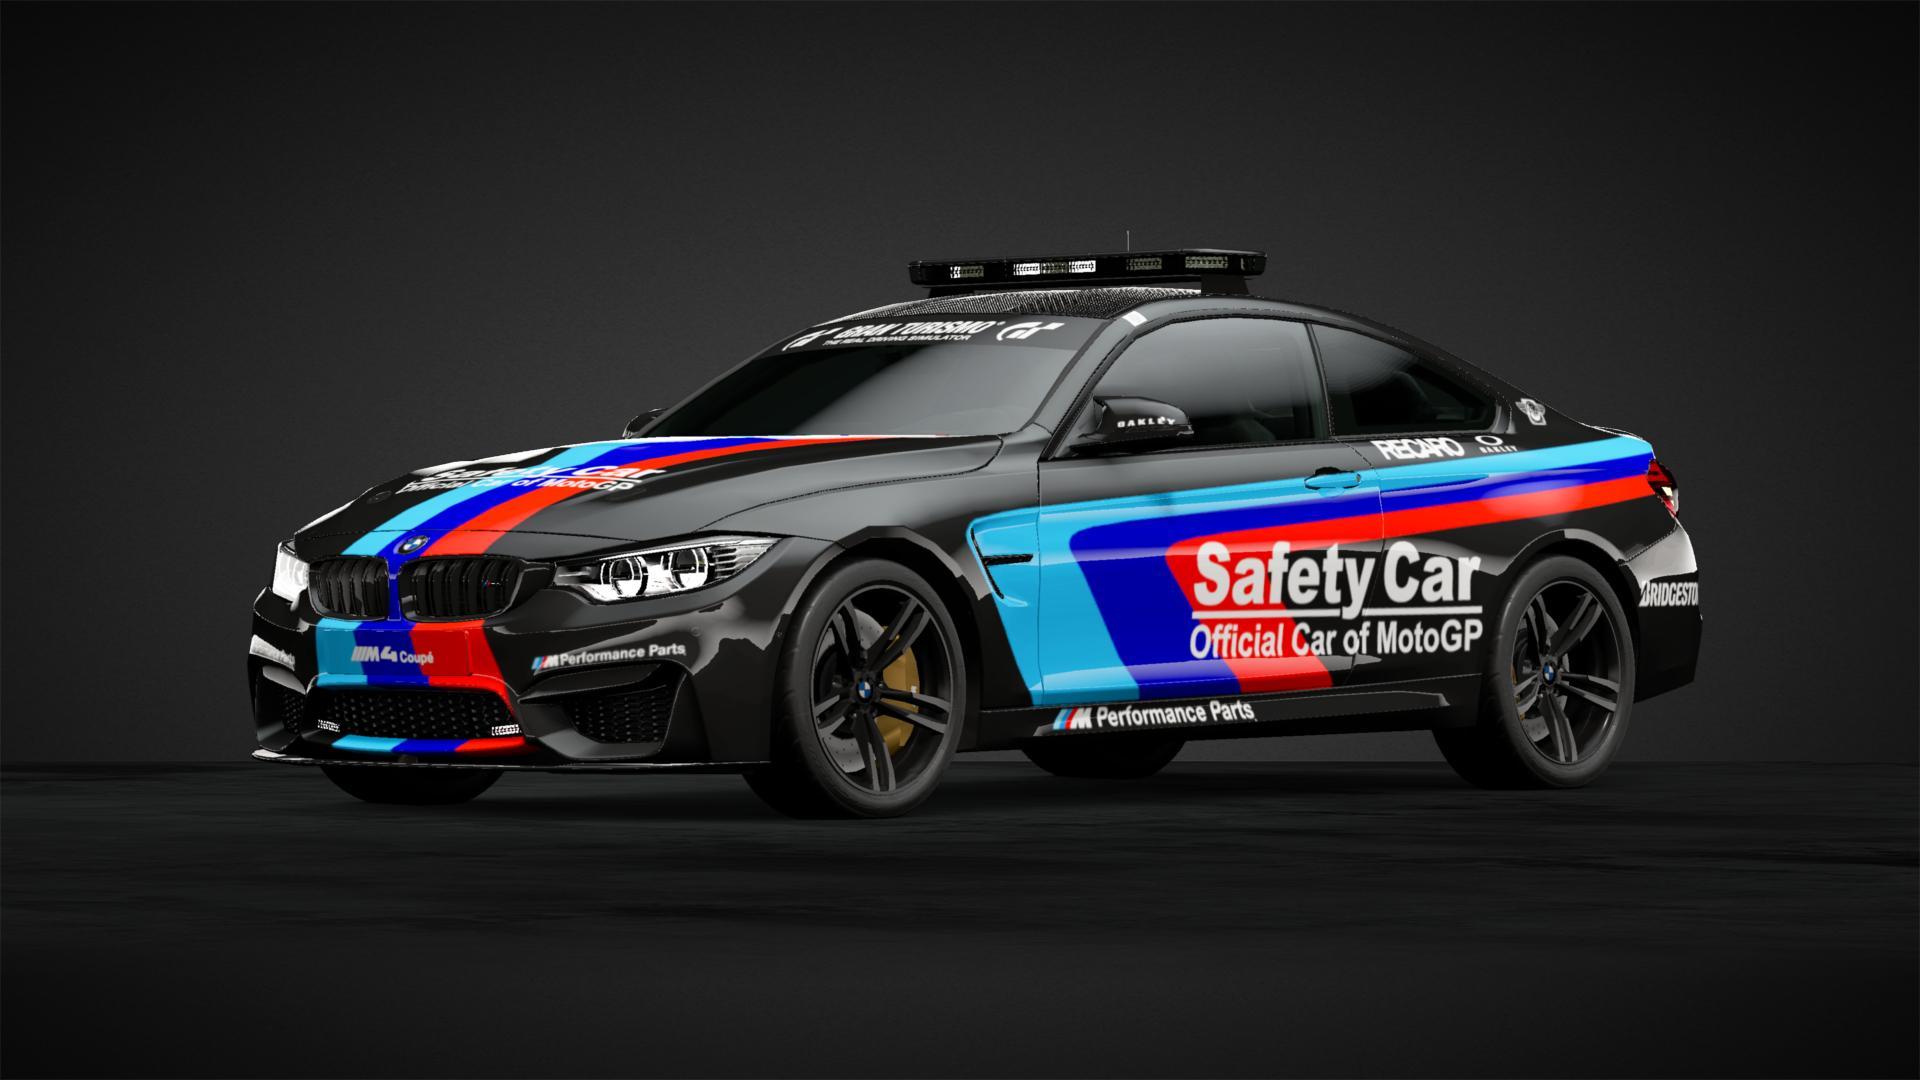 Bmw M4 Motogp Safety Car Car Livery By Zockerking Gold Community Gran Turismo Sport